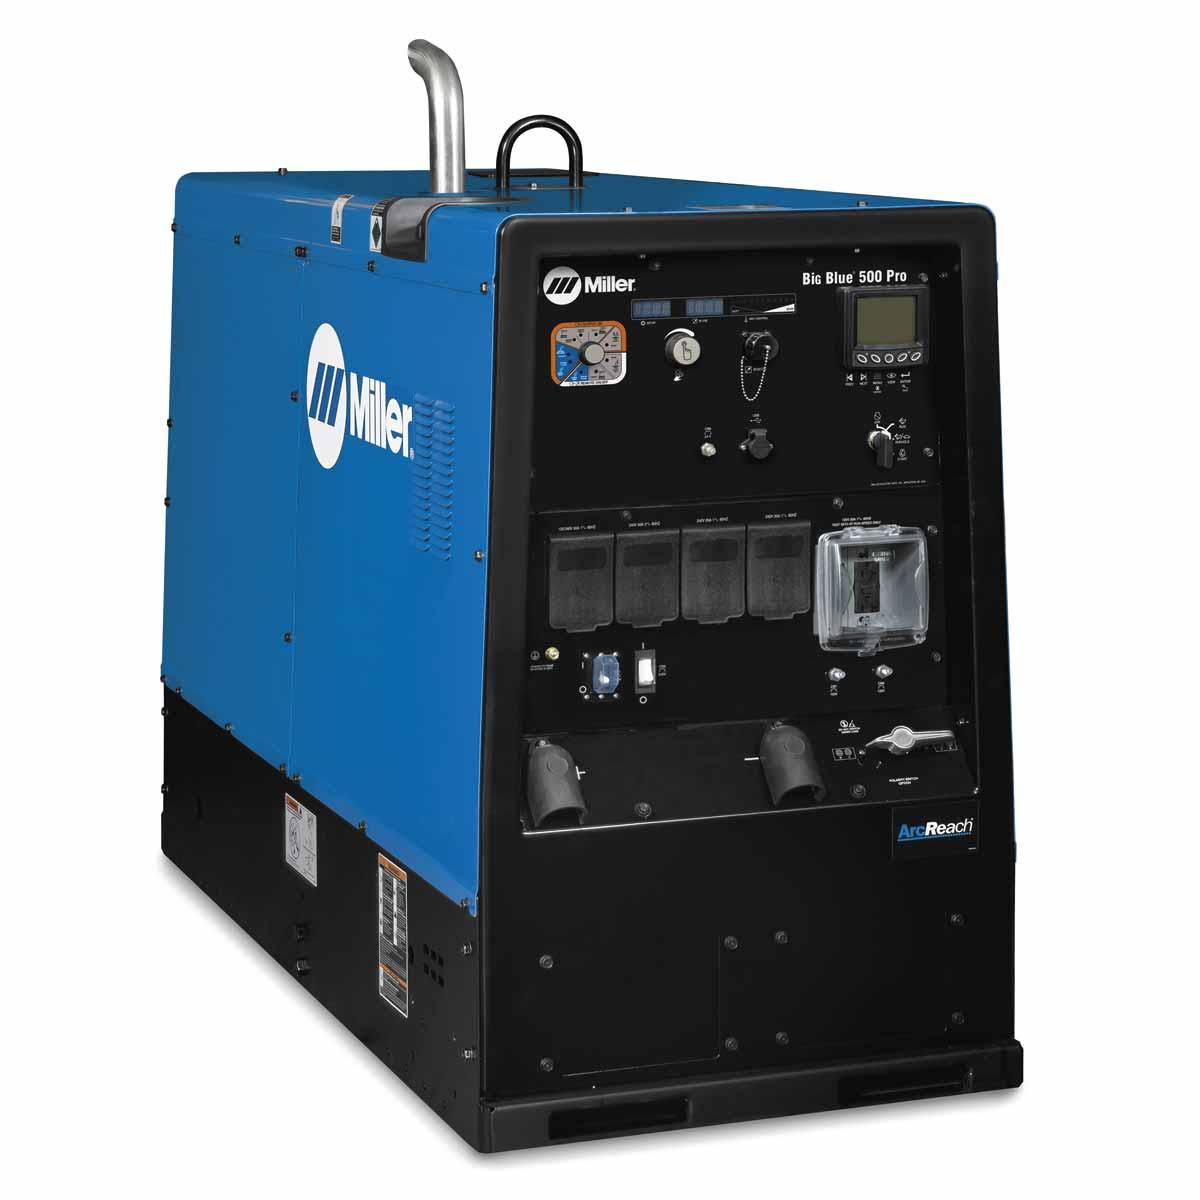 BIG BLUE 500 PRO (KUBOTA) DELUXE W/ ARCREACH 907736001